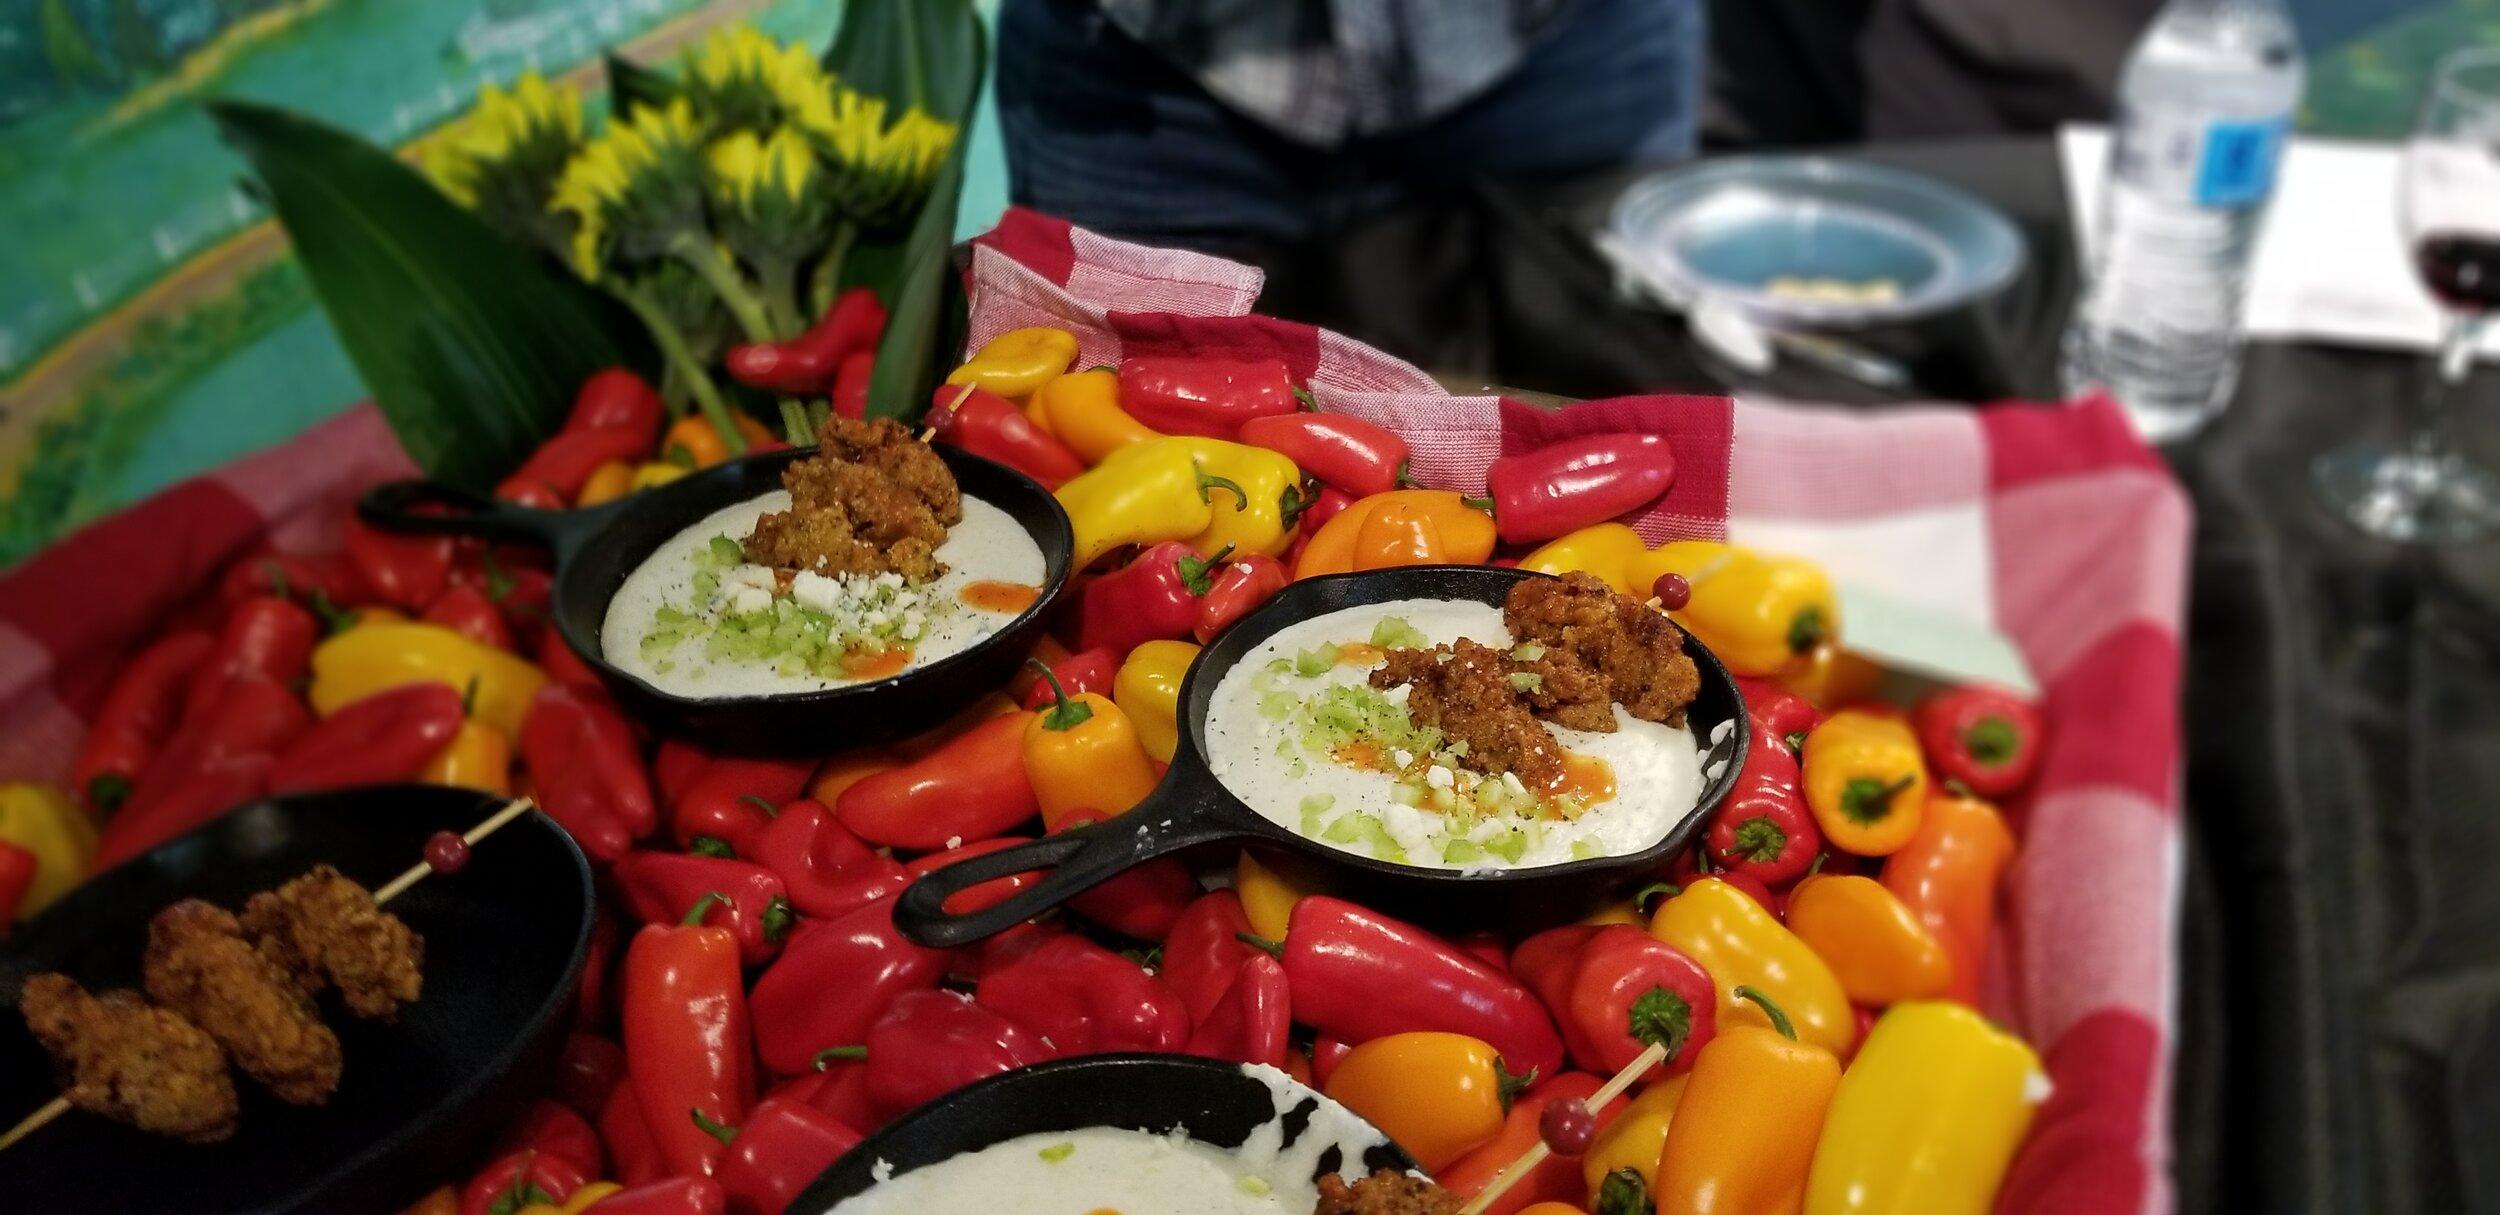 Marty's award winning dish -  Crispy Buffalo Maryland Oysters on Blue Cheese Grits